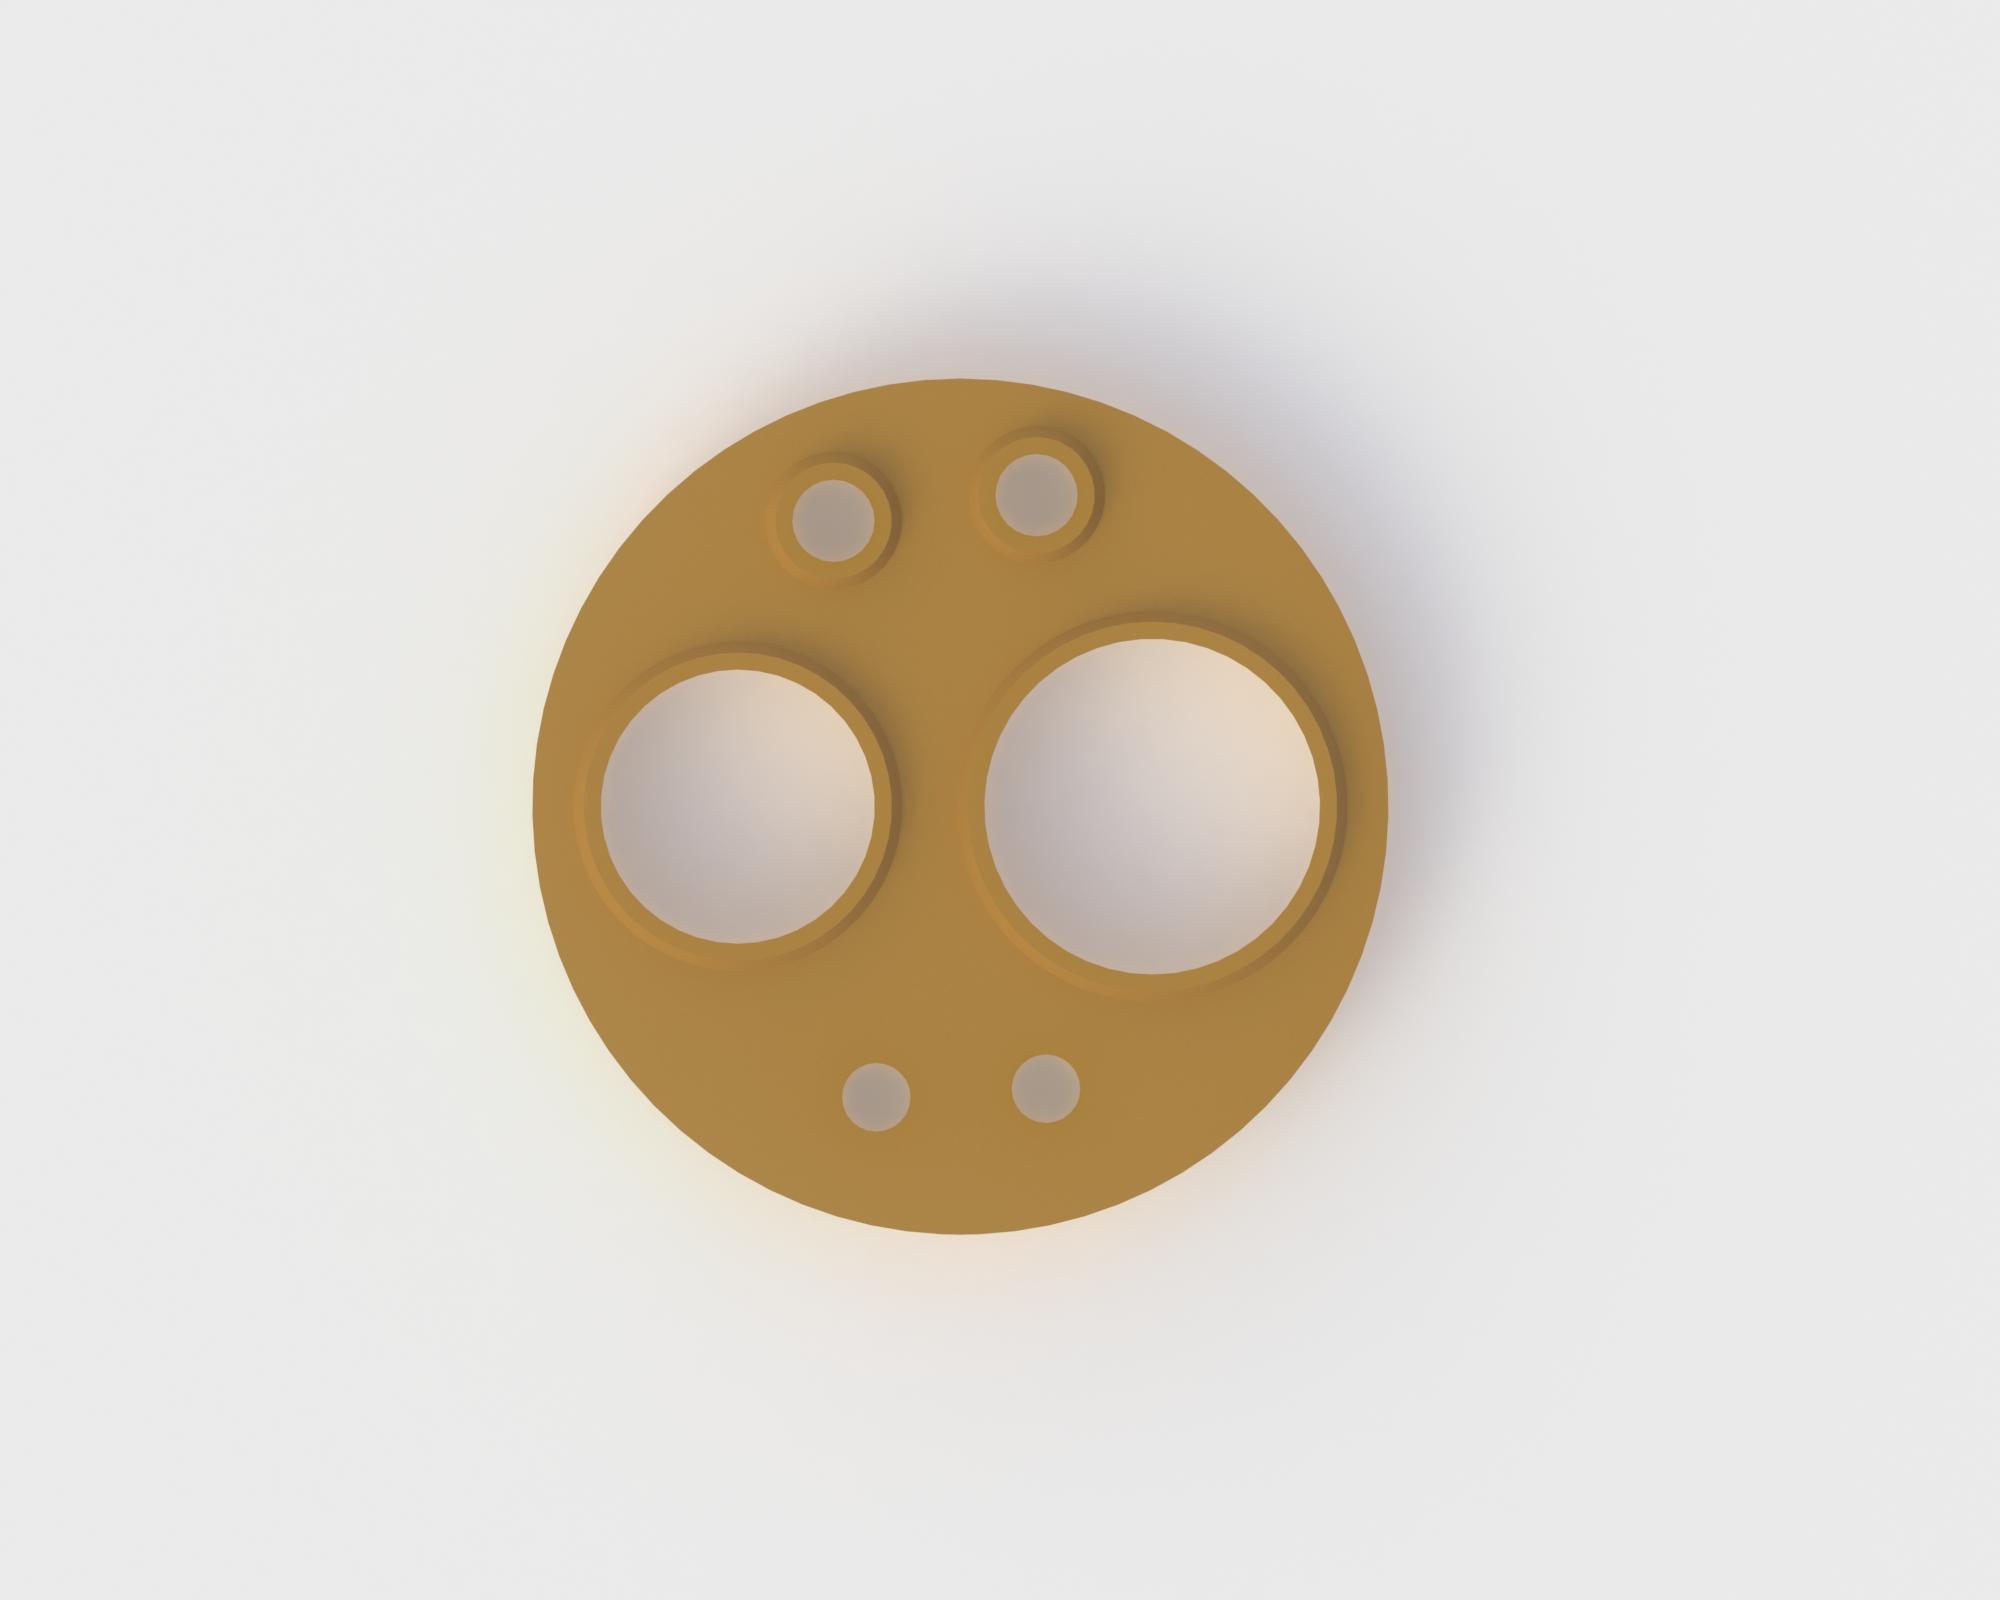 6-Hole Gasket